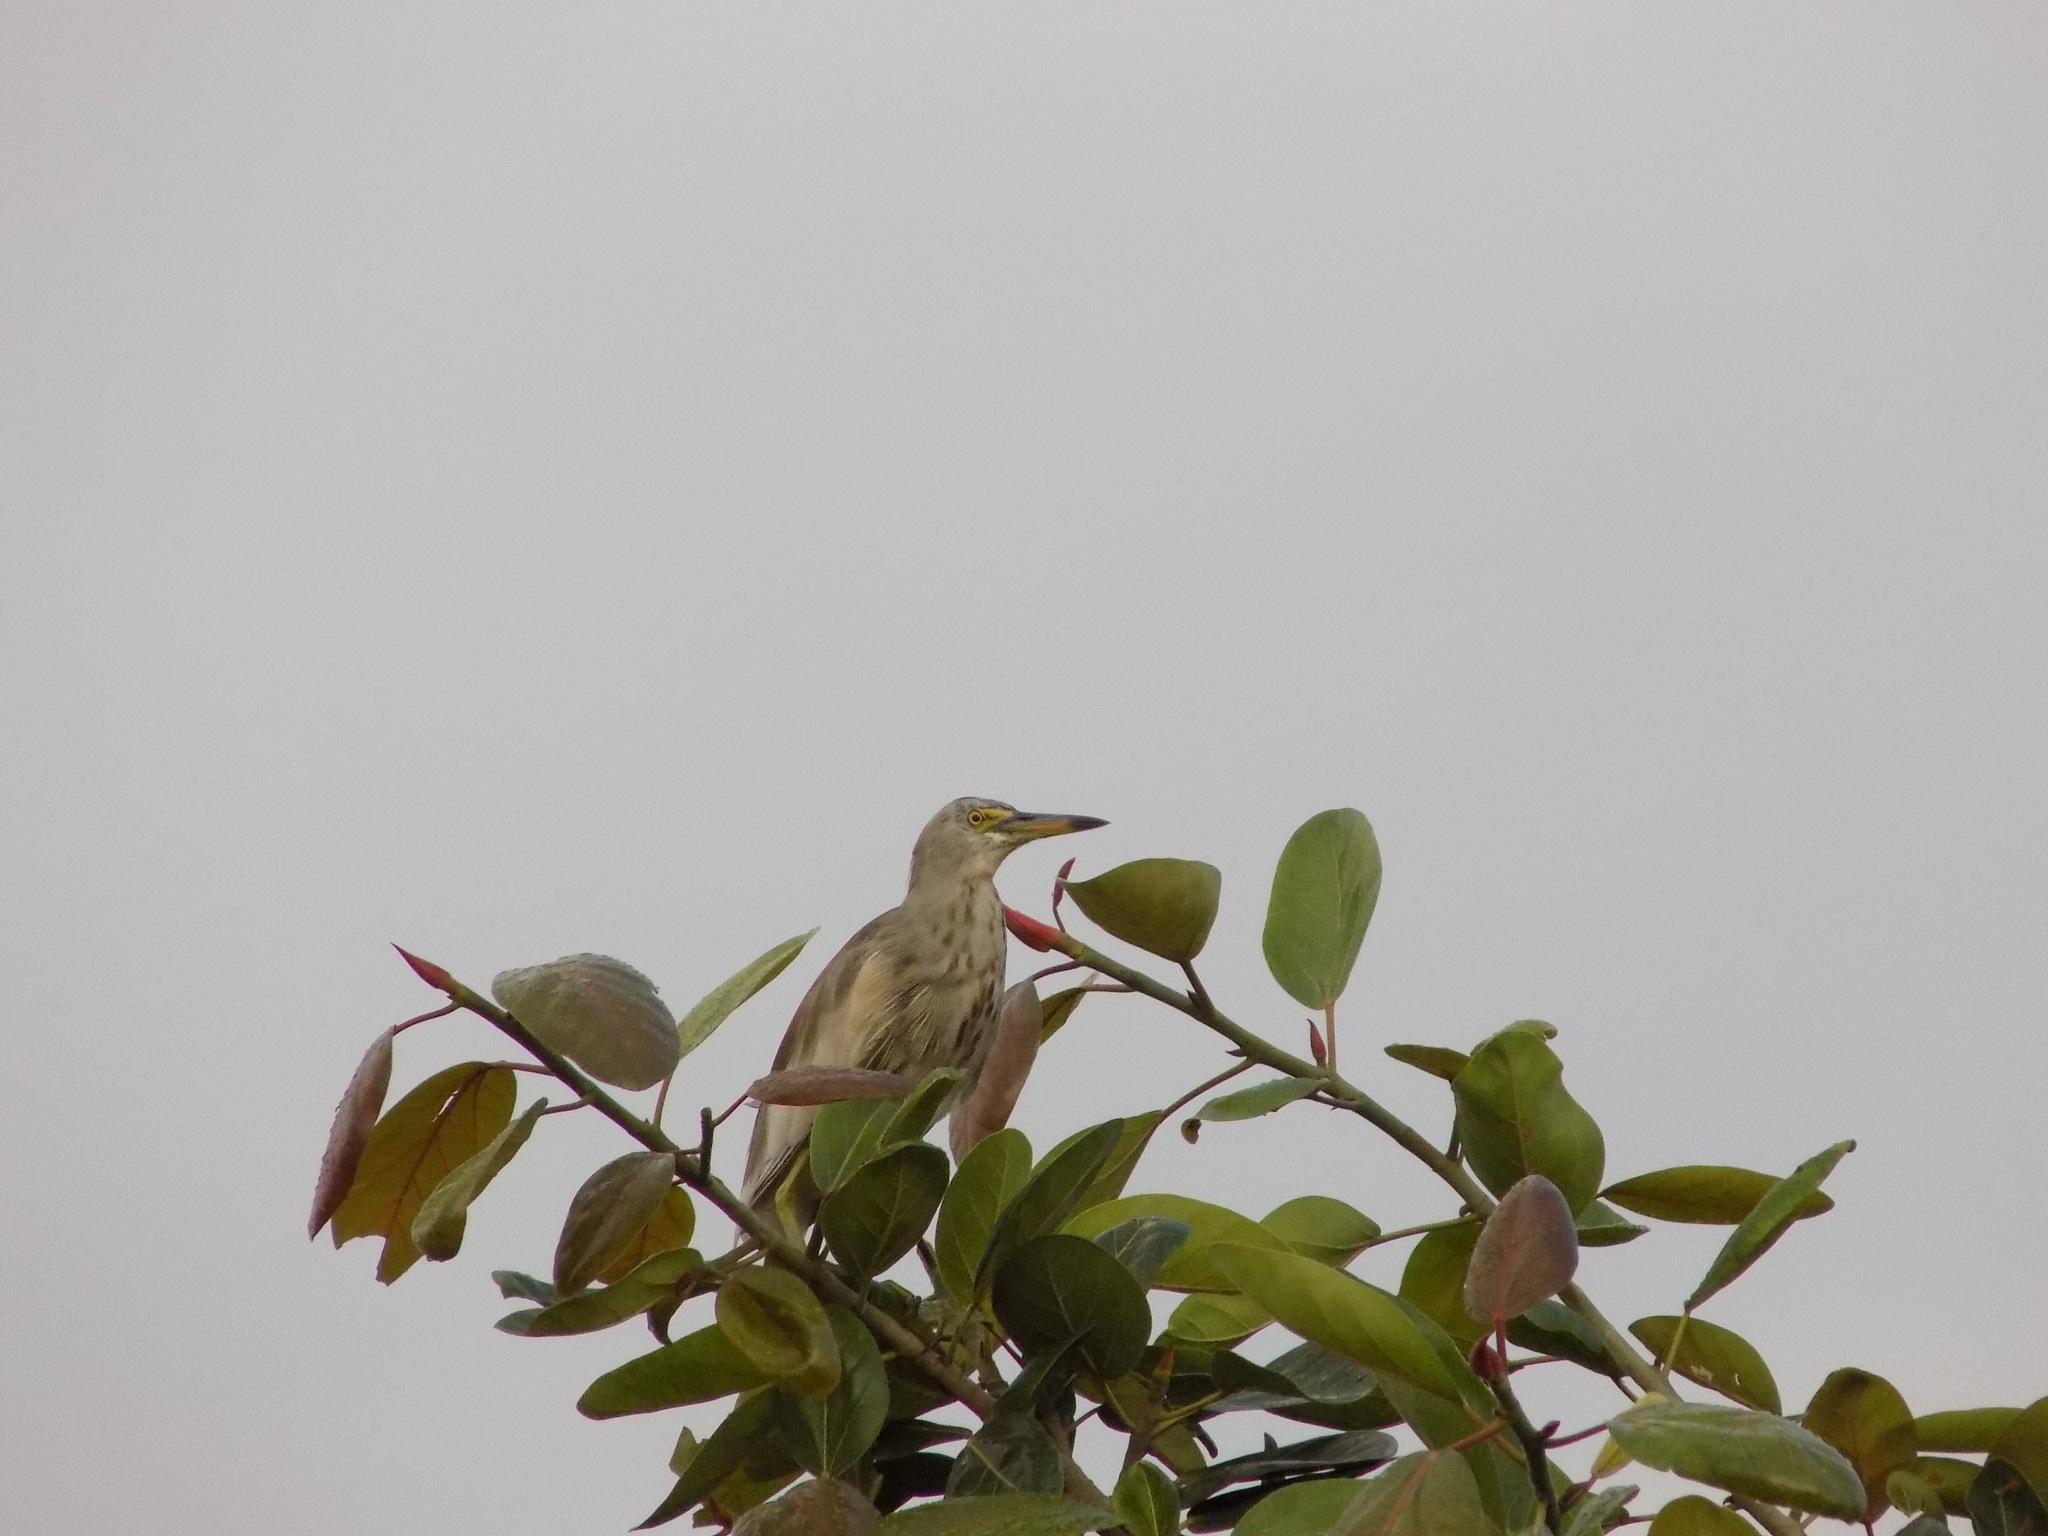 Bird on a Tree by Chandramoulieswar